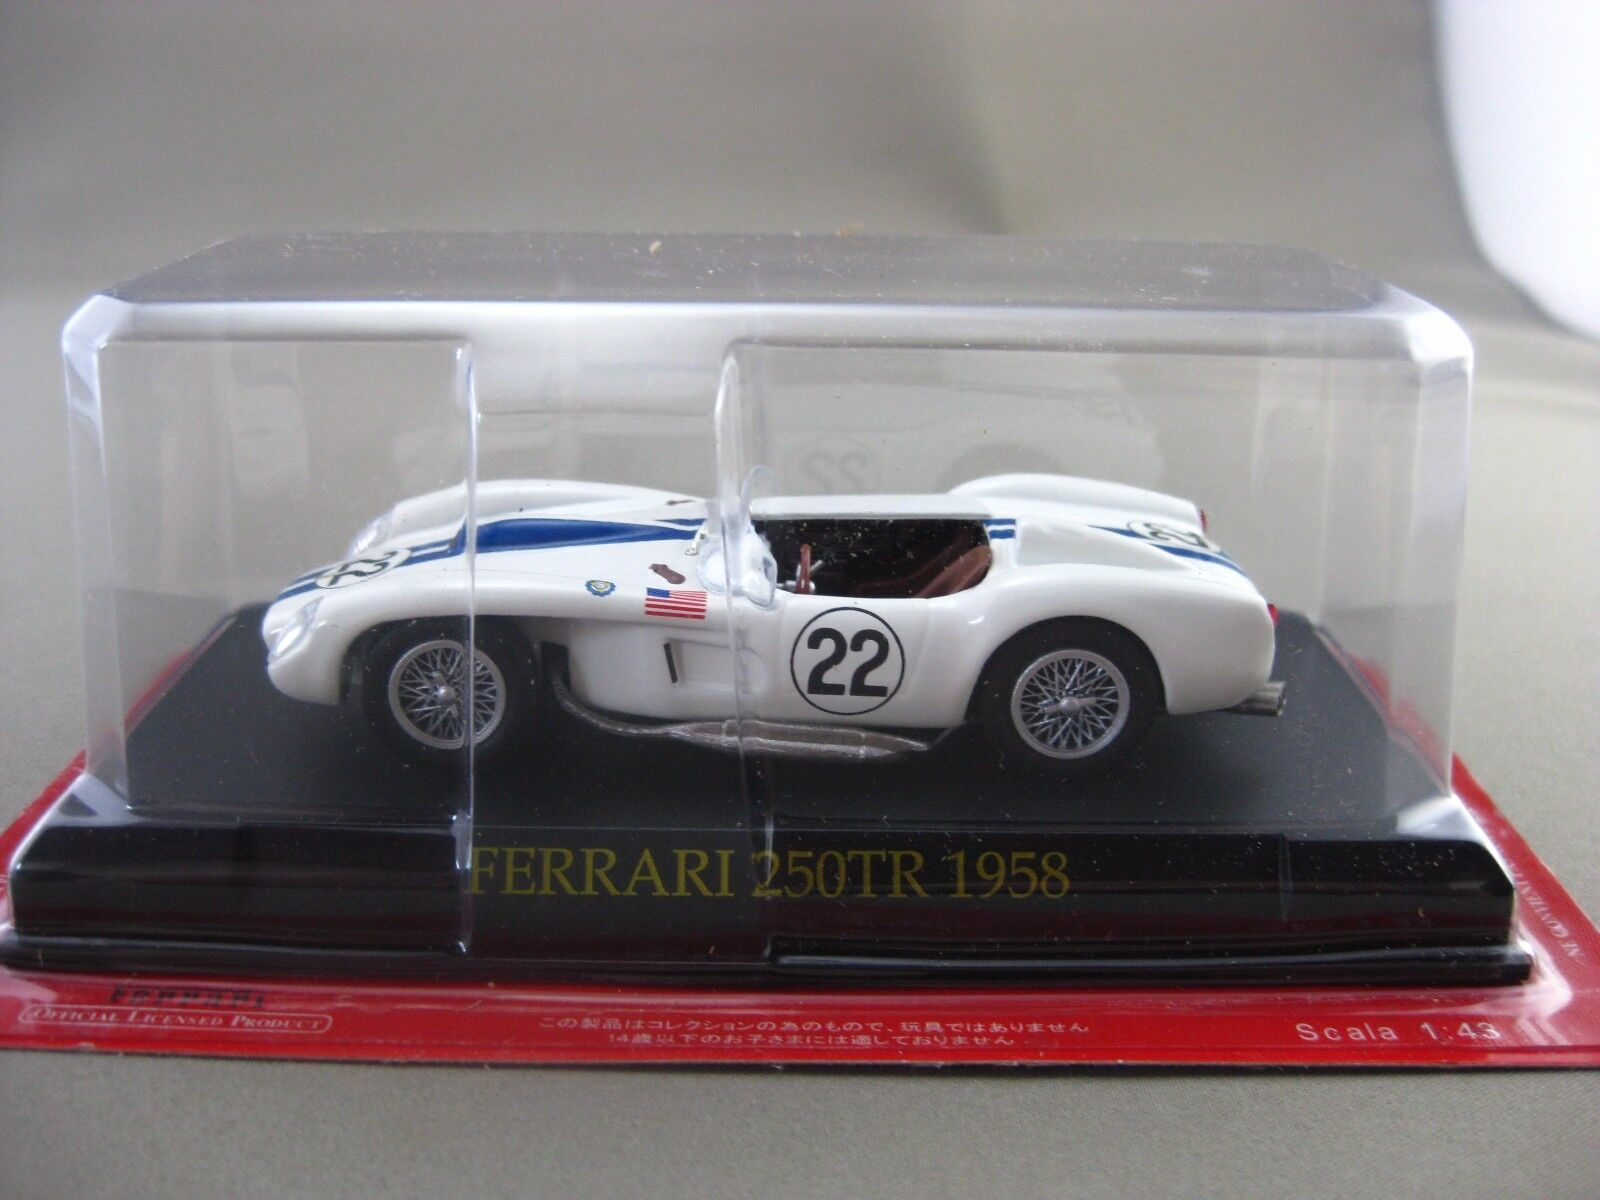 Ferrari 250TR 1958 Hachette 1 43 Diecast voiture Vol.42